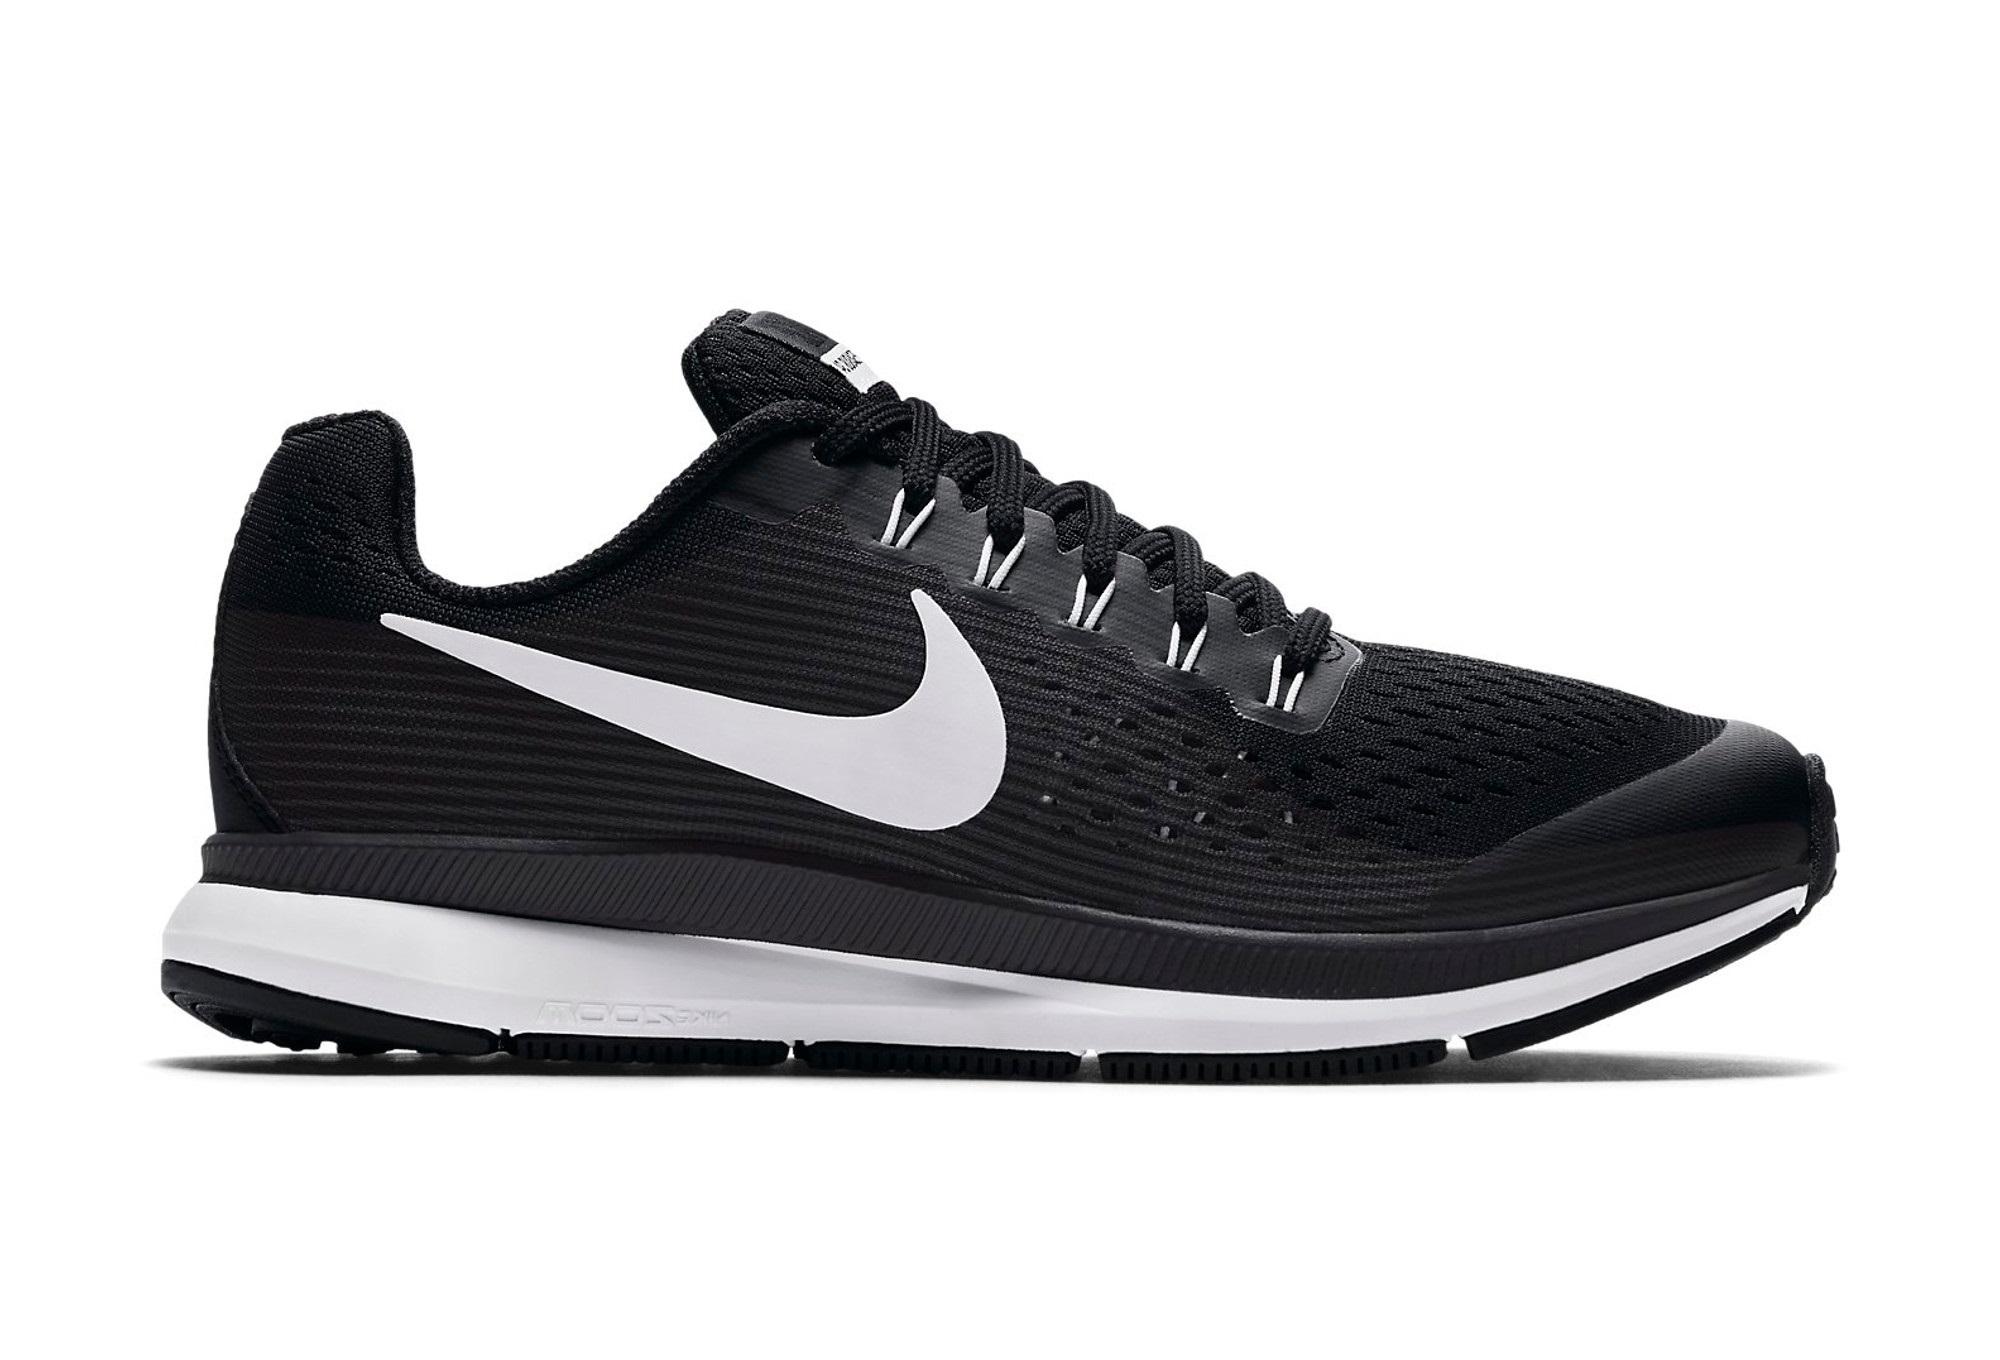 Chaussures Enfant Nike Air Zoom Pegasus 34 Blanc / Noir